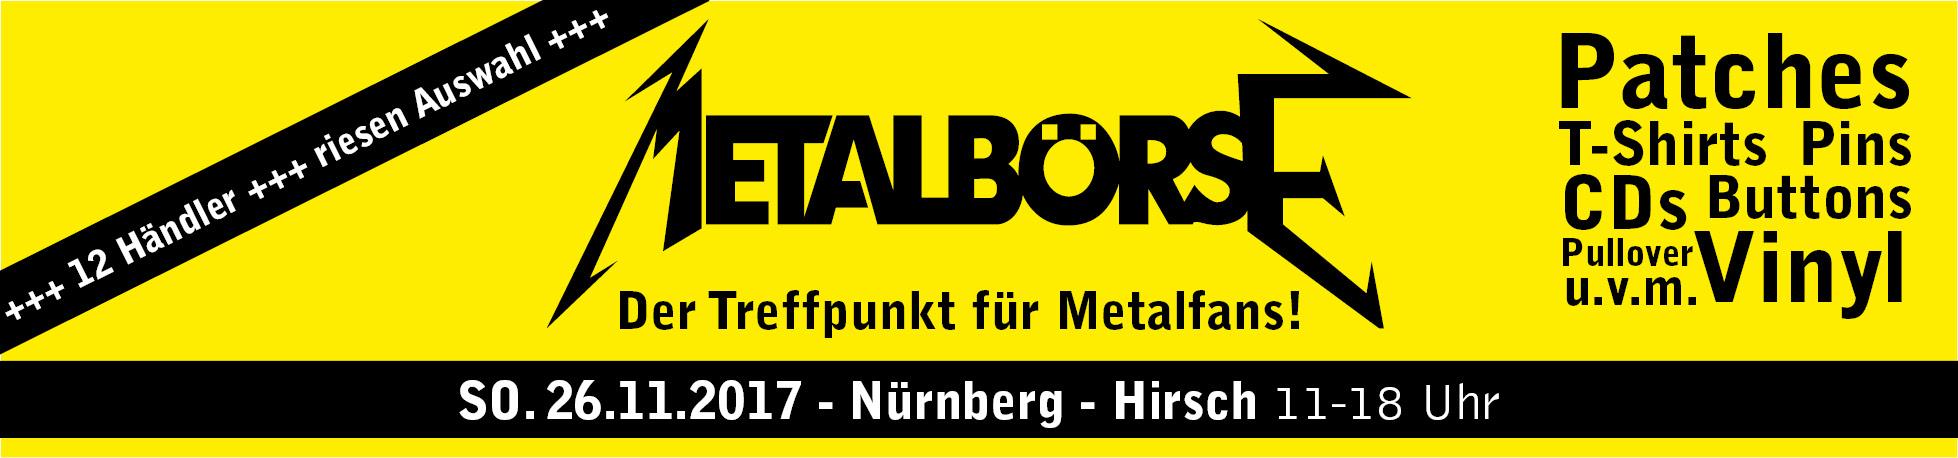 Metalbörse Nürnberg 2017